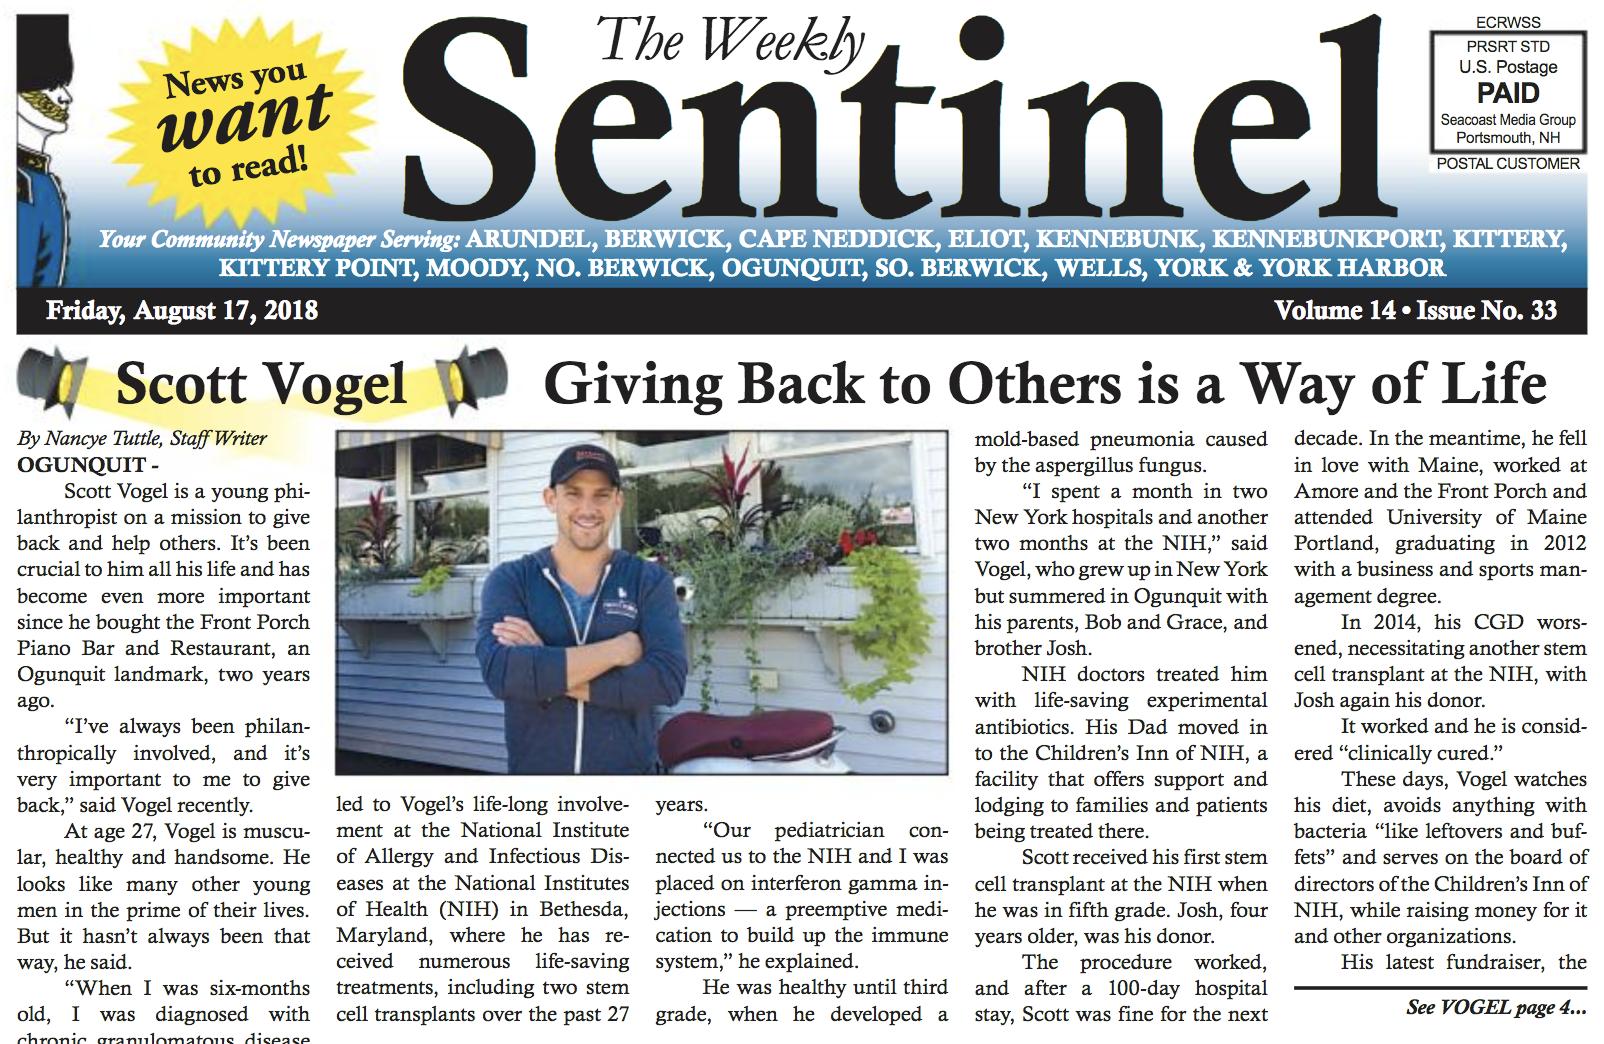 Scott Vogel newspaper article